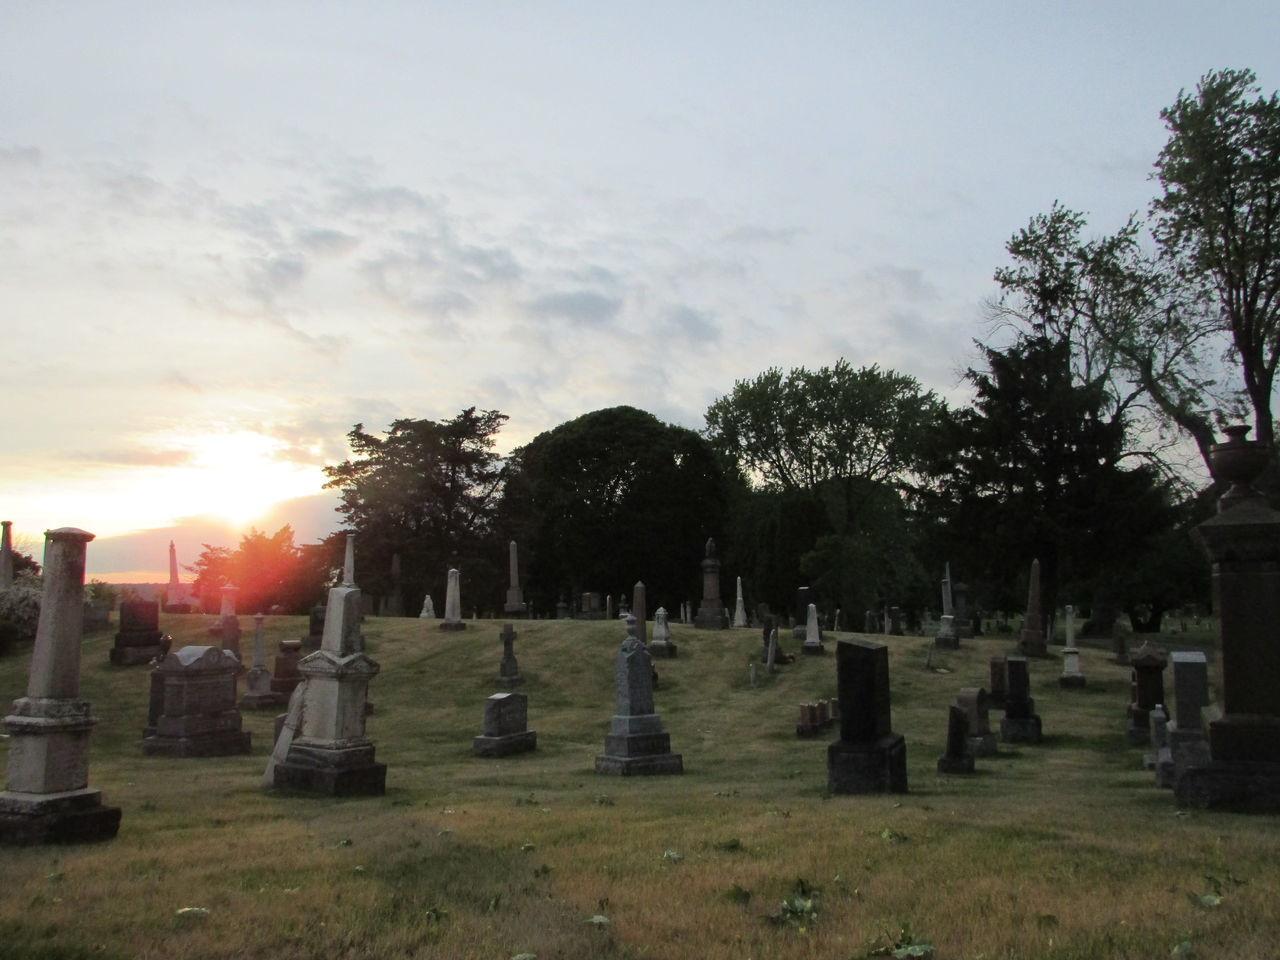 Cemetary Cemetary Beauty Gravestones Graveyard Graveyard Beauty Headstones Mausoleum No People Old Cemetery Old Graveyard Outdoors Sunset